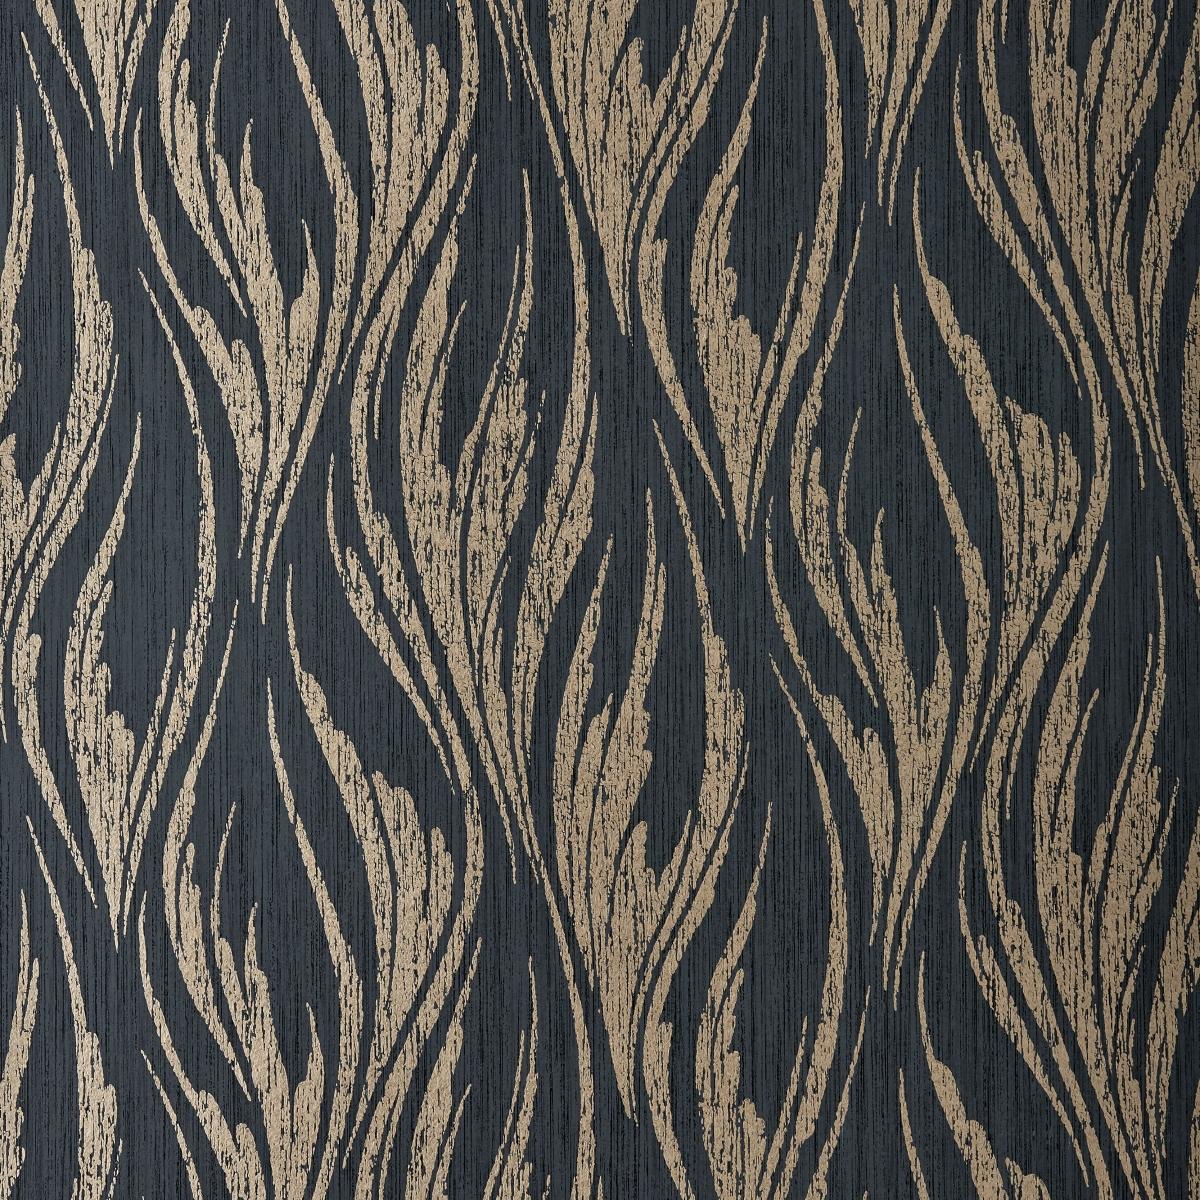 Tapet Ripple, 1838 Wallcoverings, 5.3mp / rola